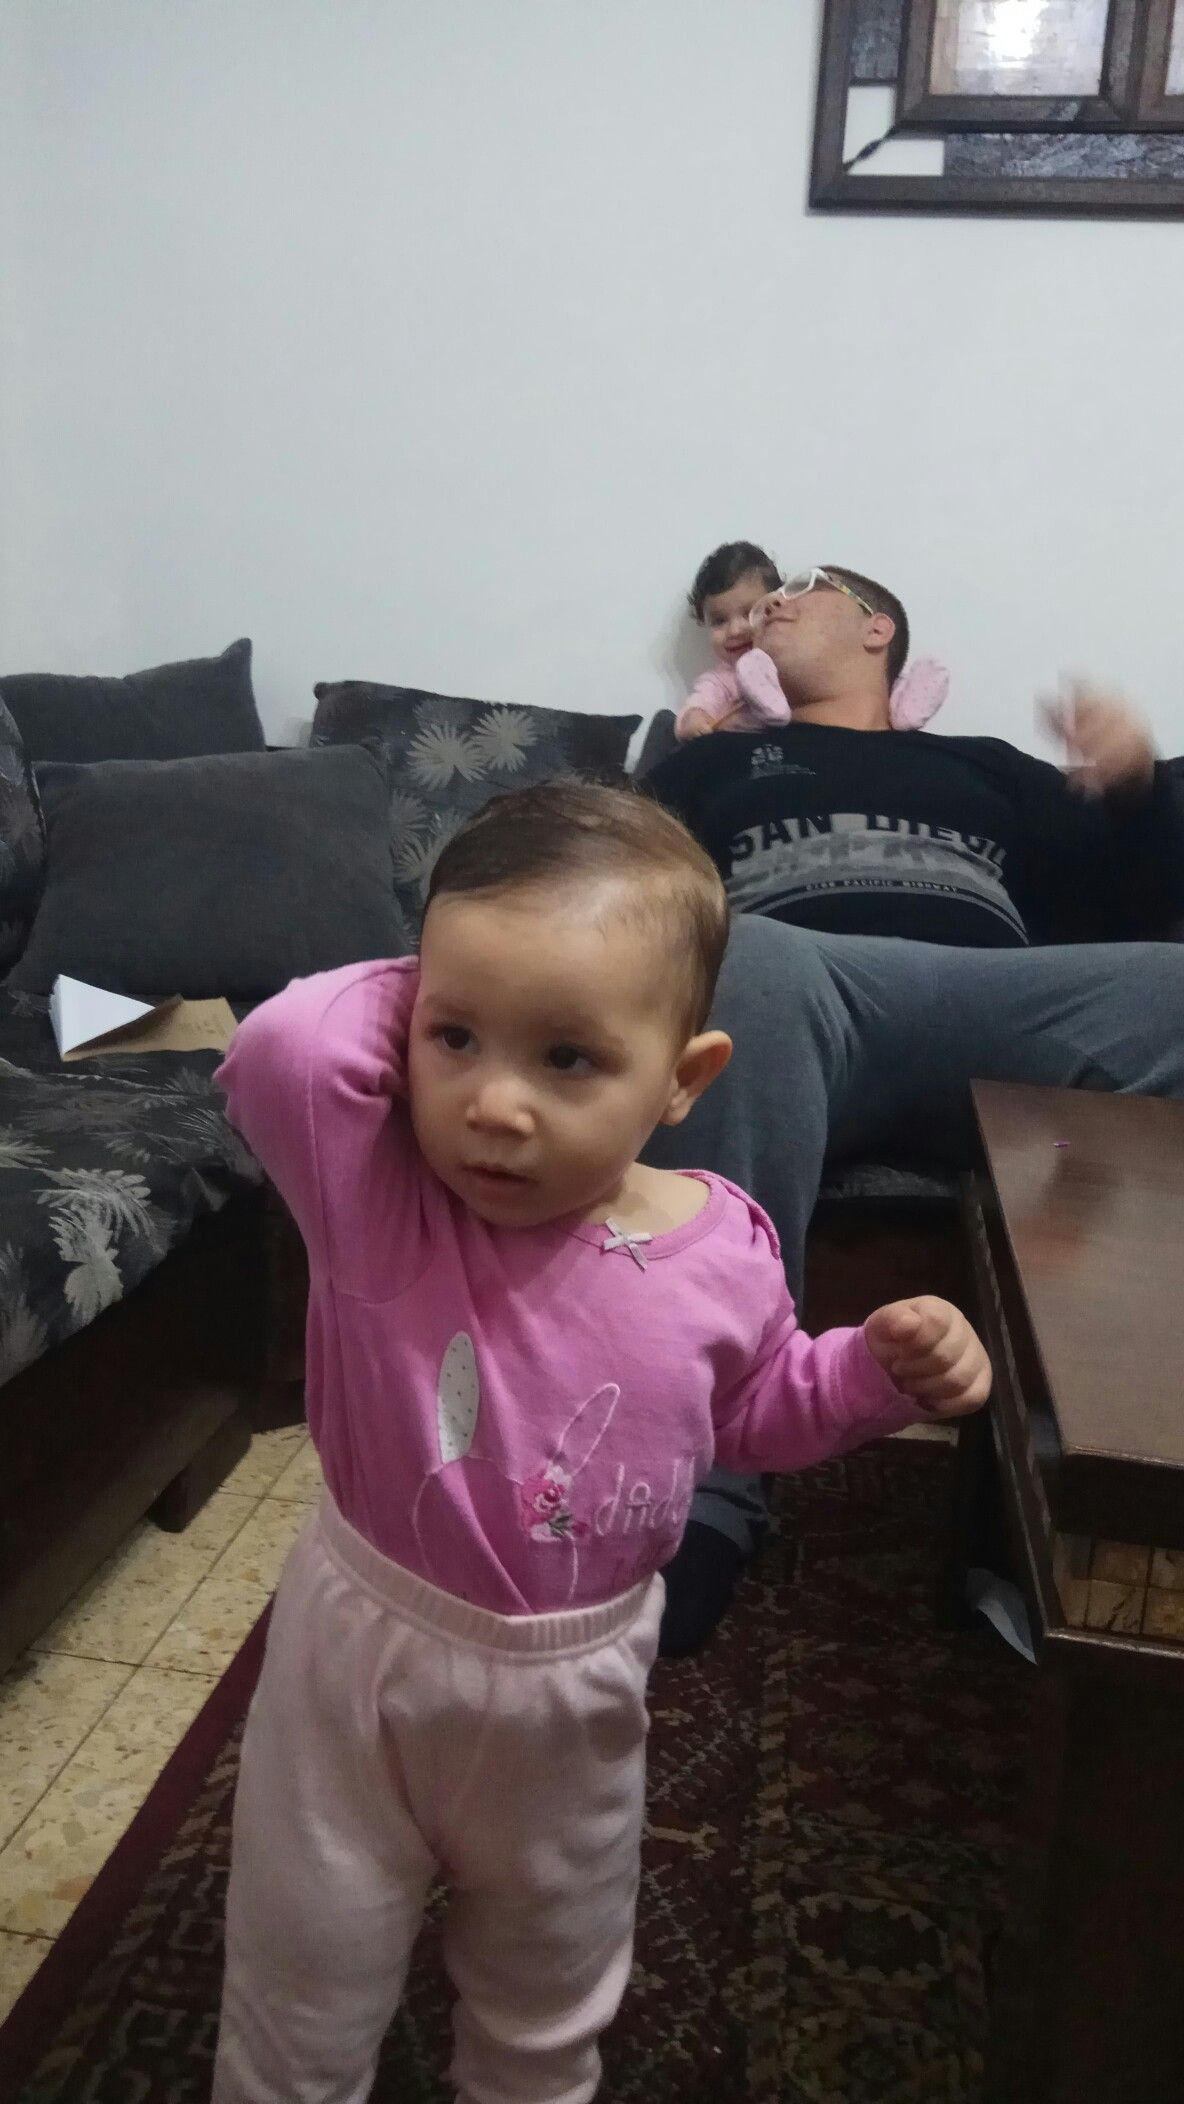 هاجر احمد عارف Baby Face High Chair Home Decor